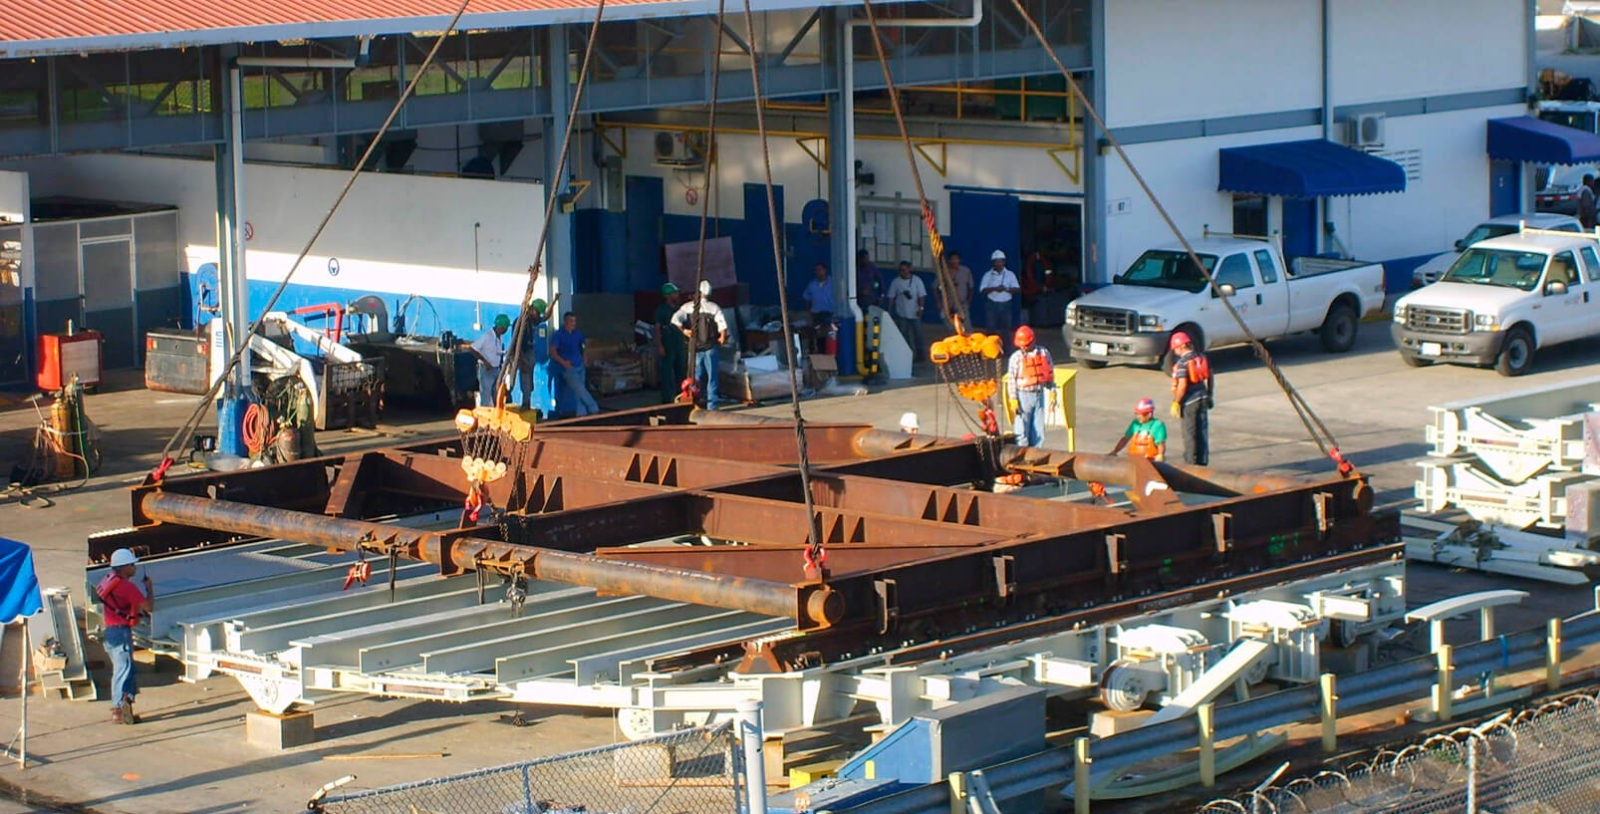 Locomotive_Turntables_Gatun_Locks_Panama_Canal_IDOM_5_